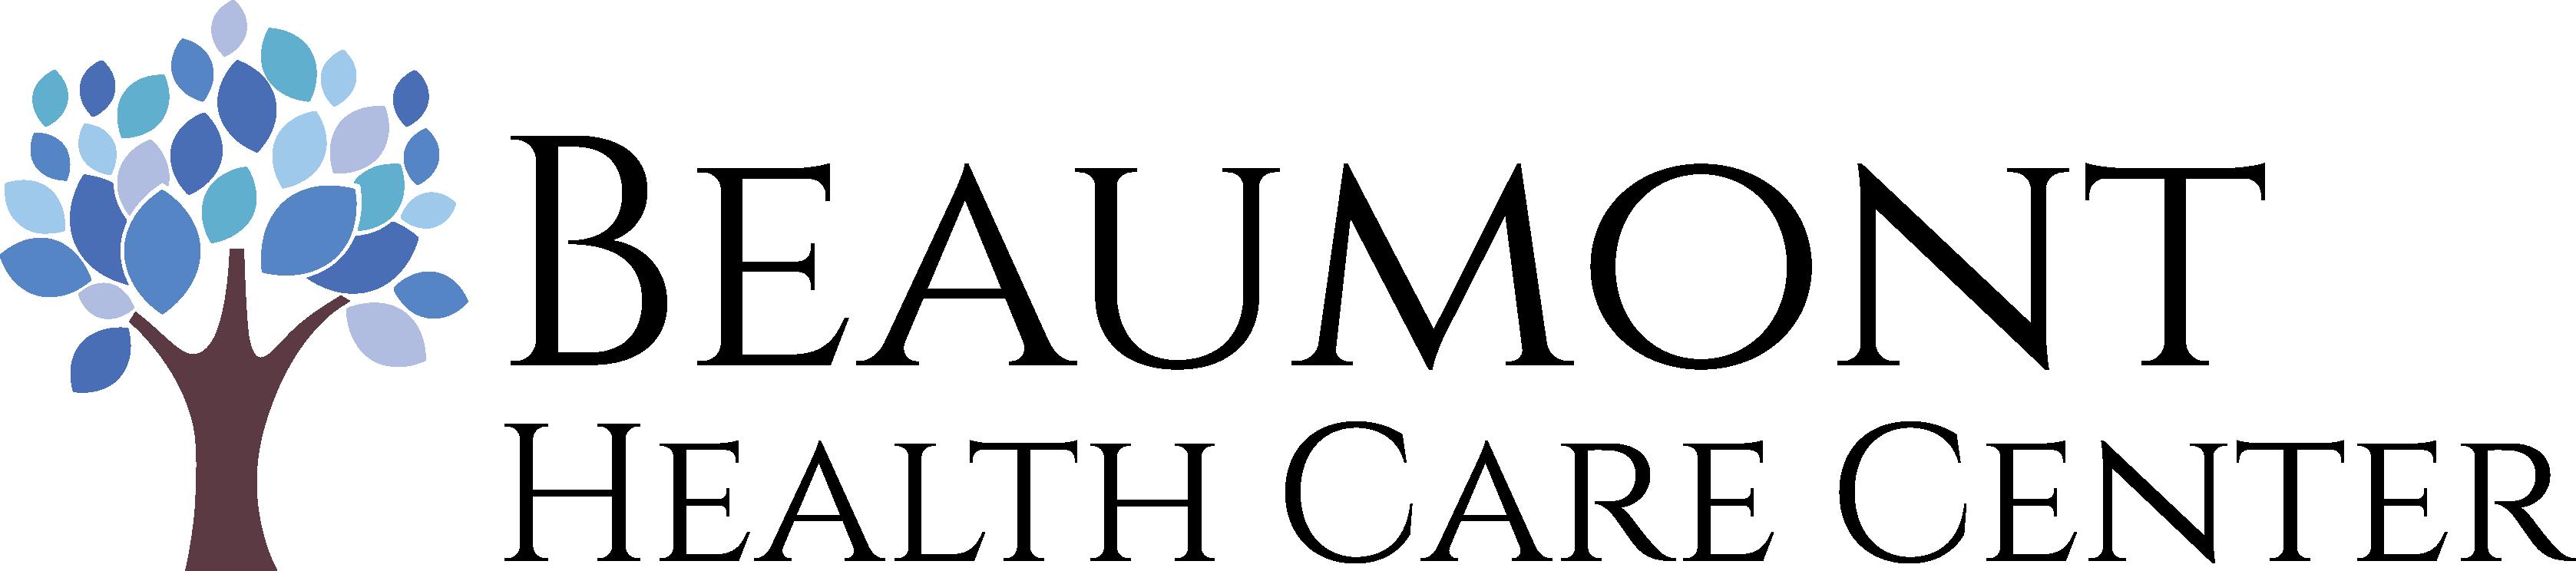 Beaumont Health Care Center